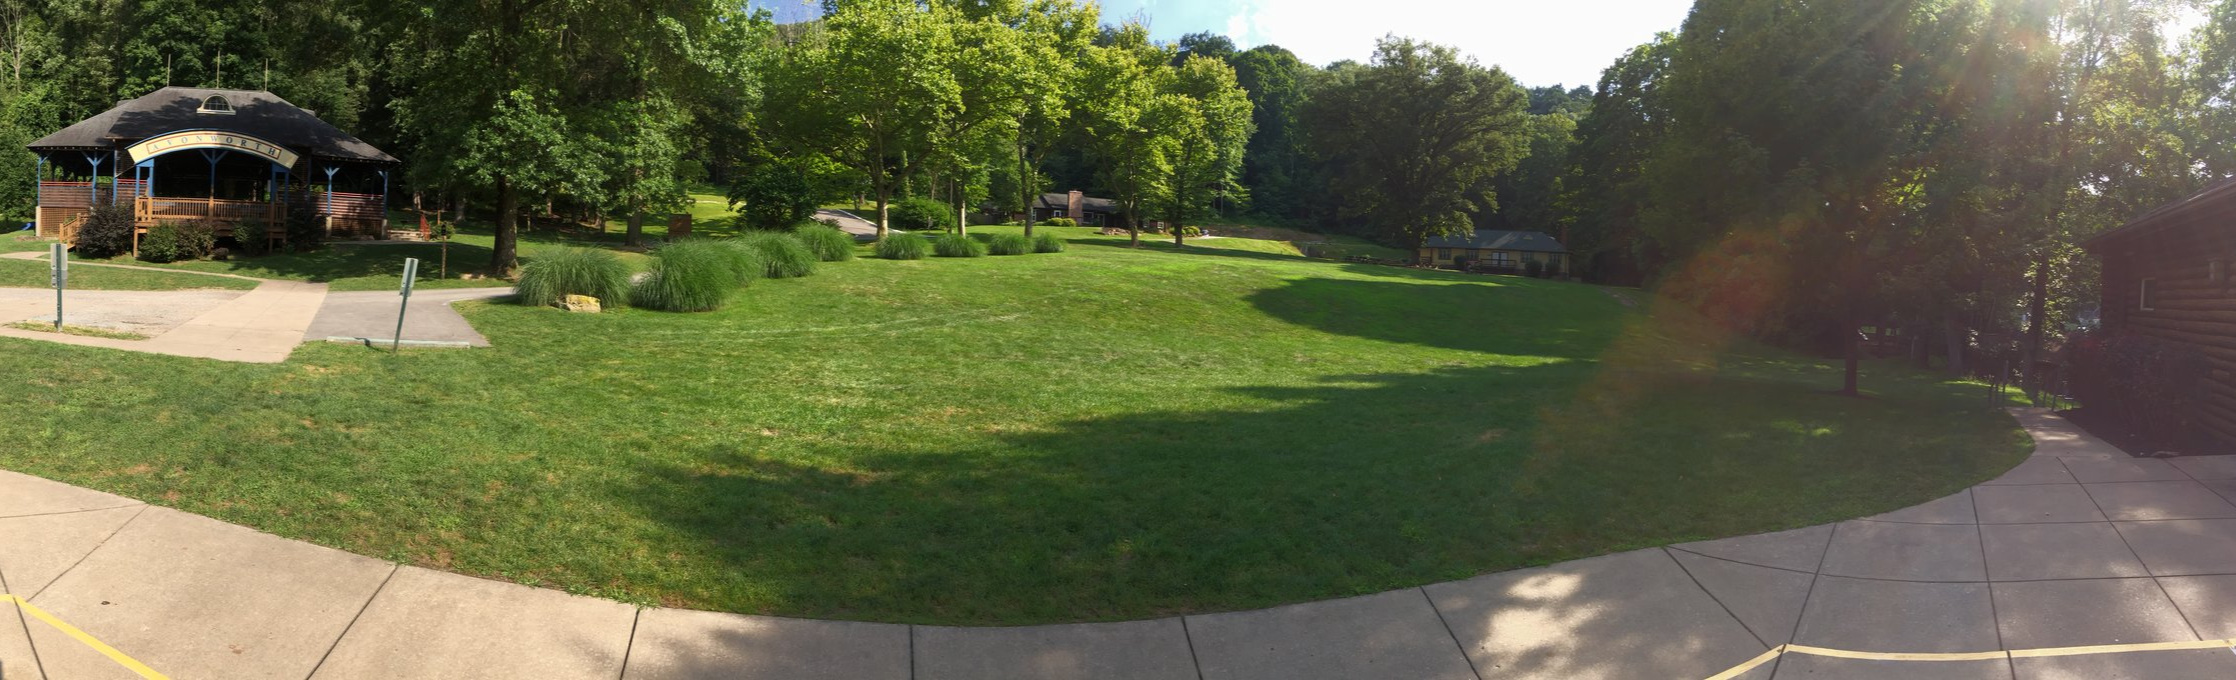 Avonworth-community-park-field-IMG_4611.jpg